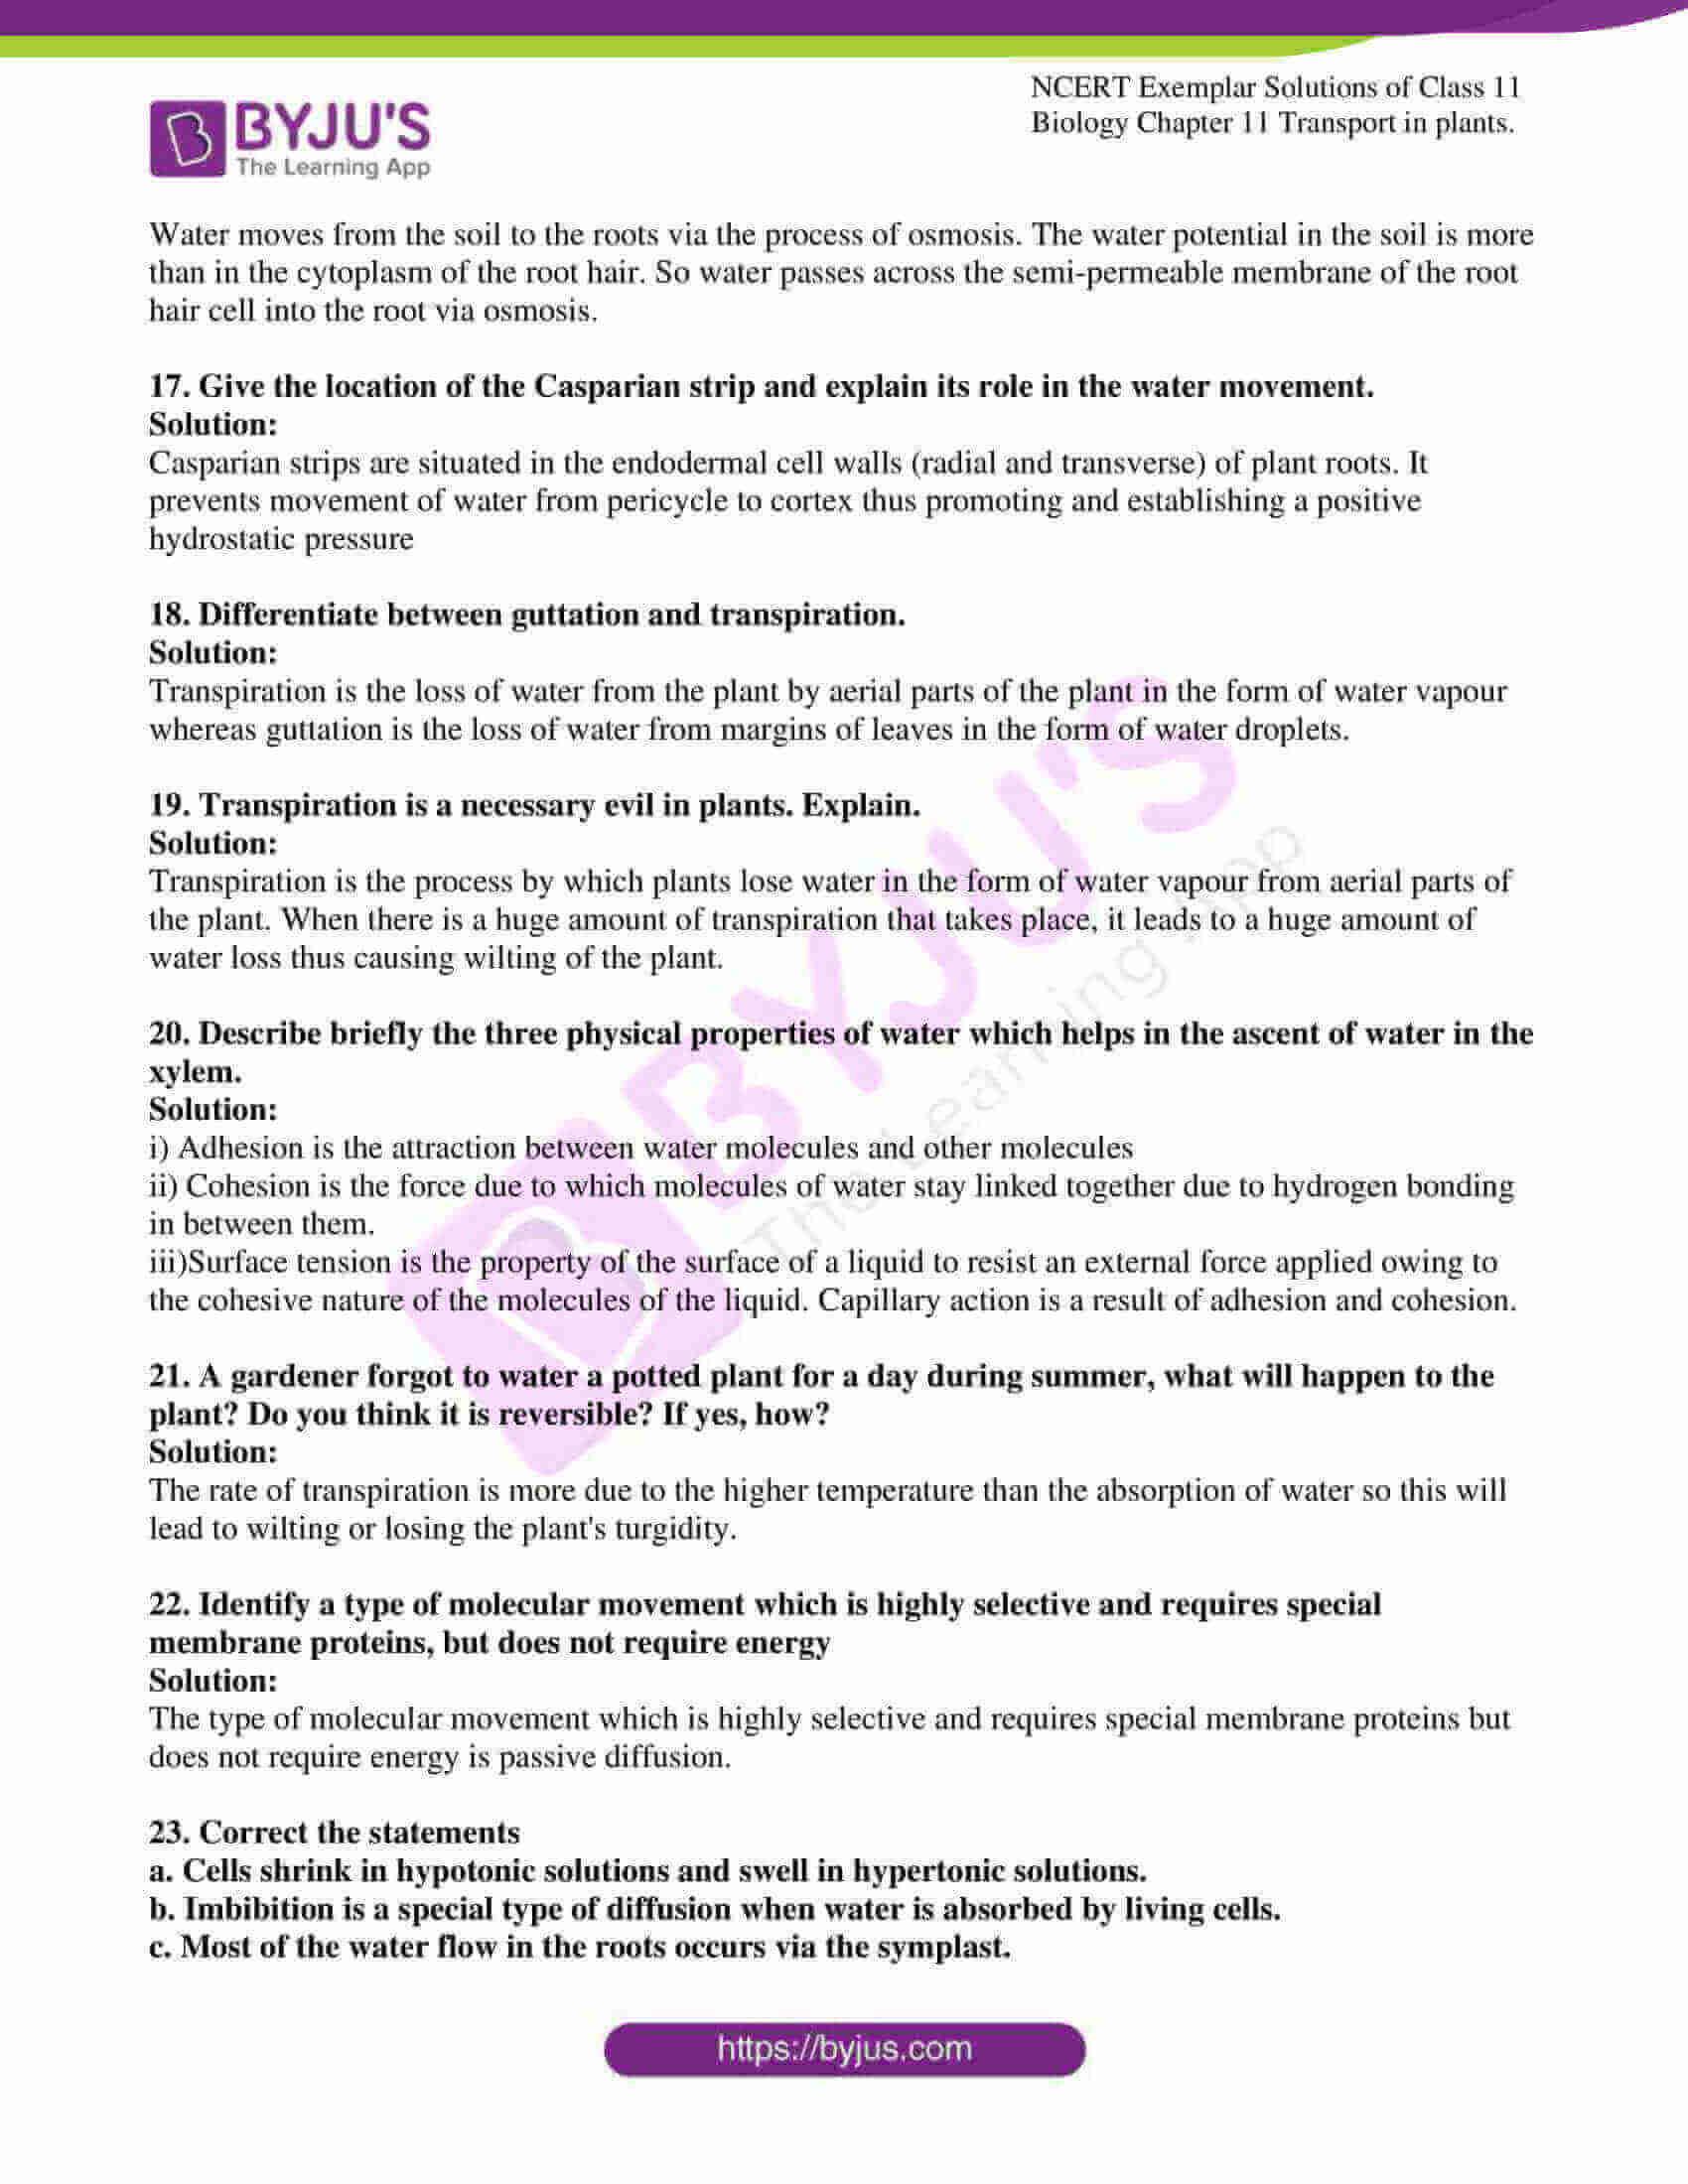 ncert exemplar solutions for class 11 bio chapter 11 07